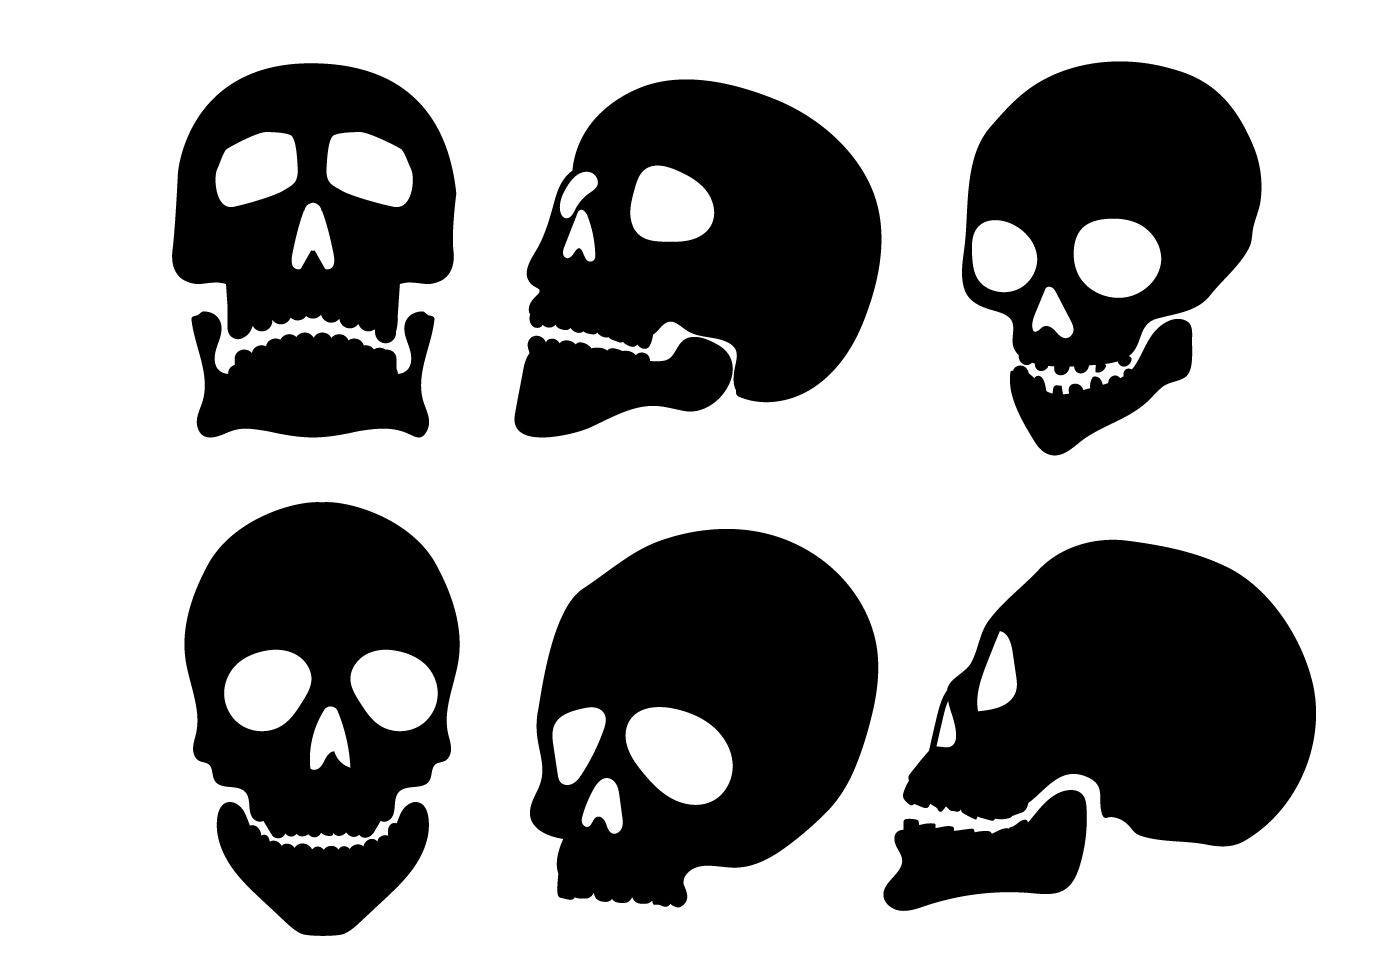 skull silhouette vectors download free vector art  stock dead fish bones clipart dead fish skeleton clipart